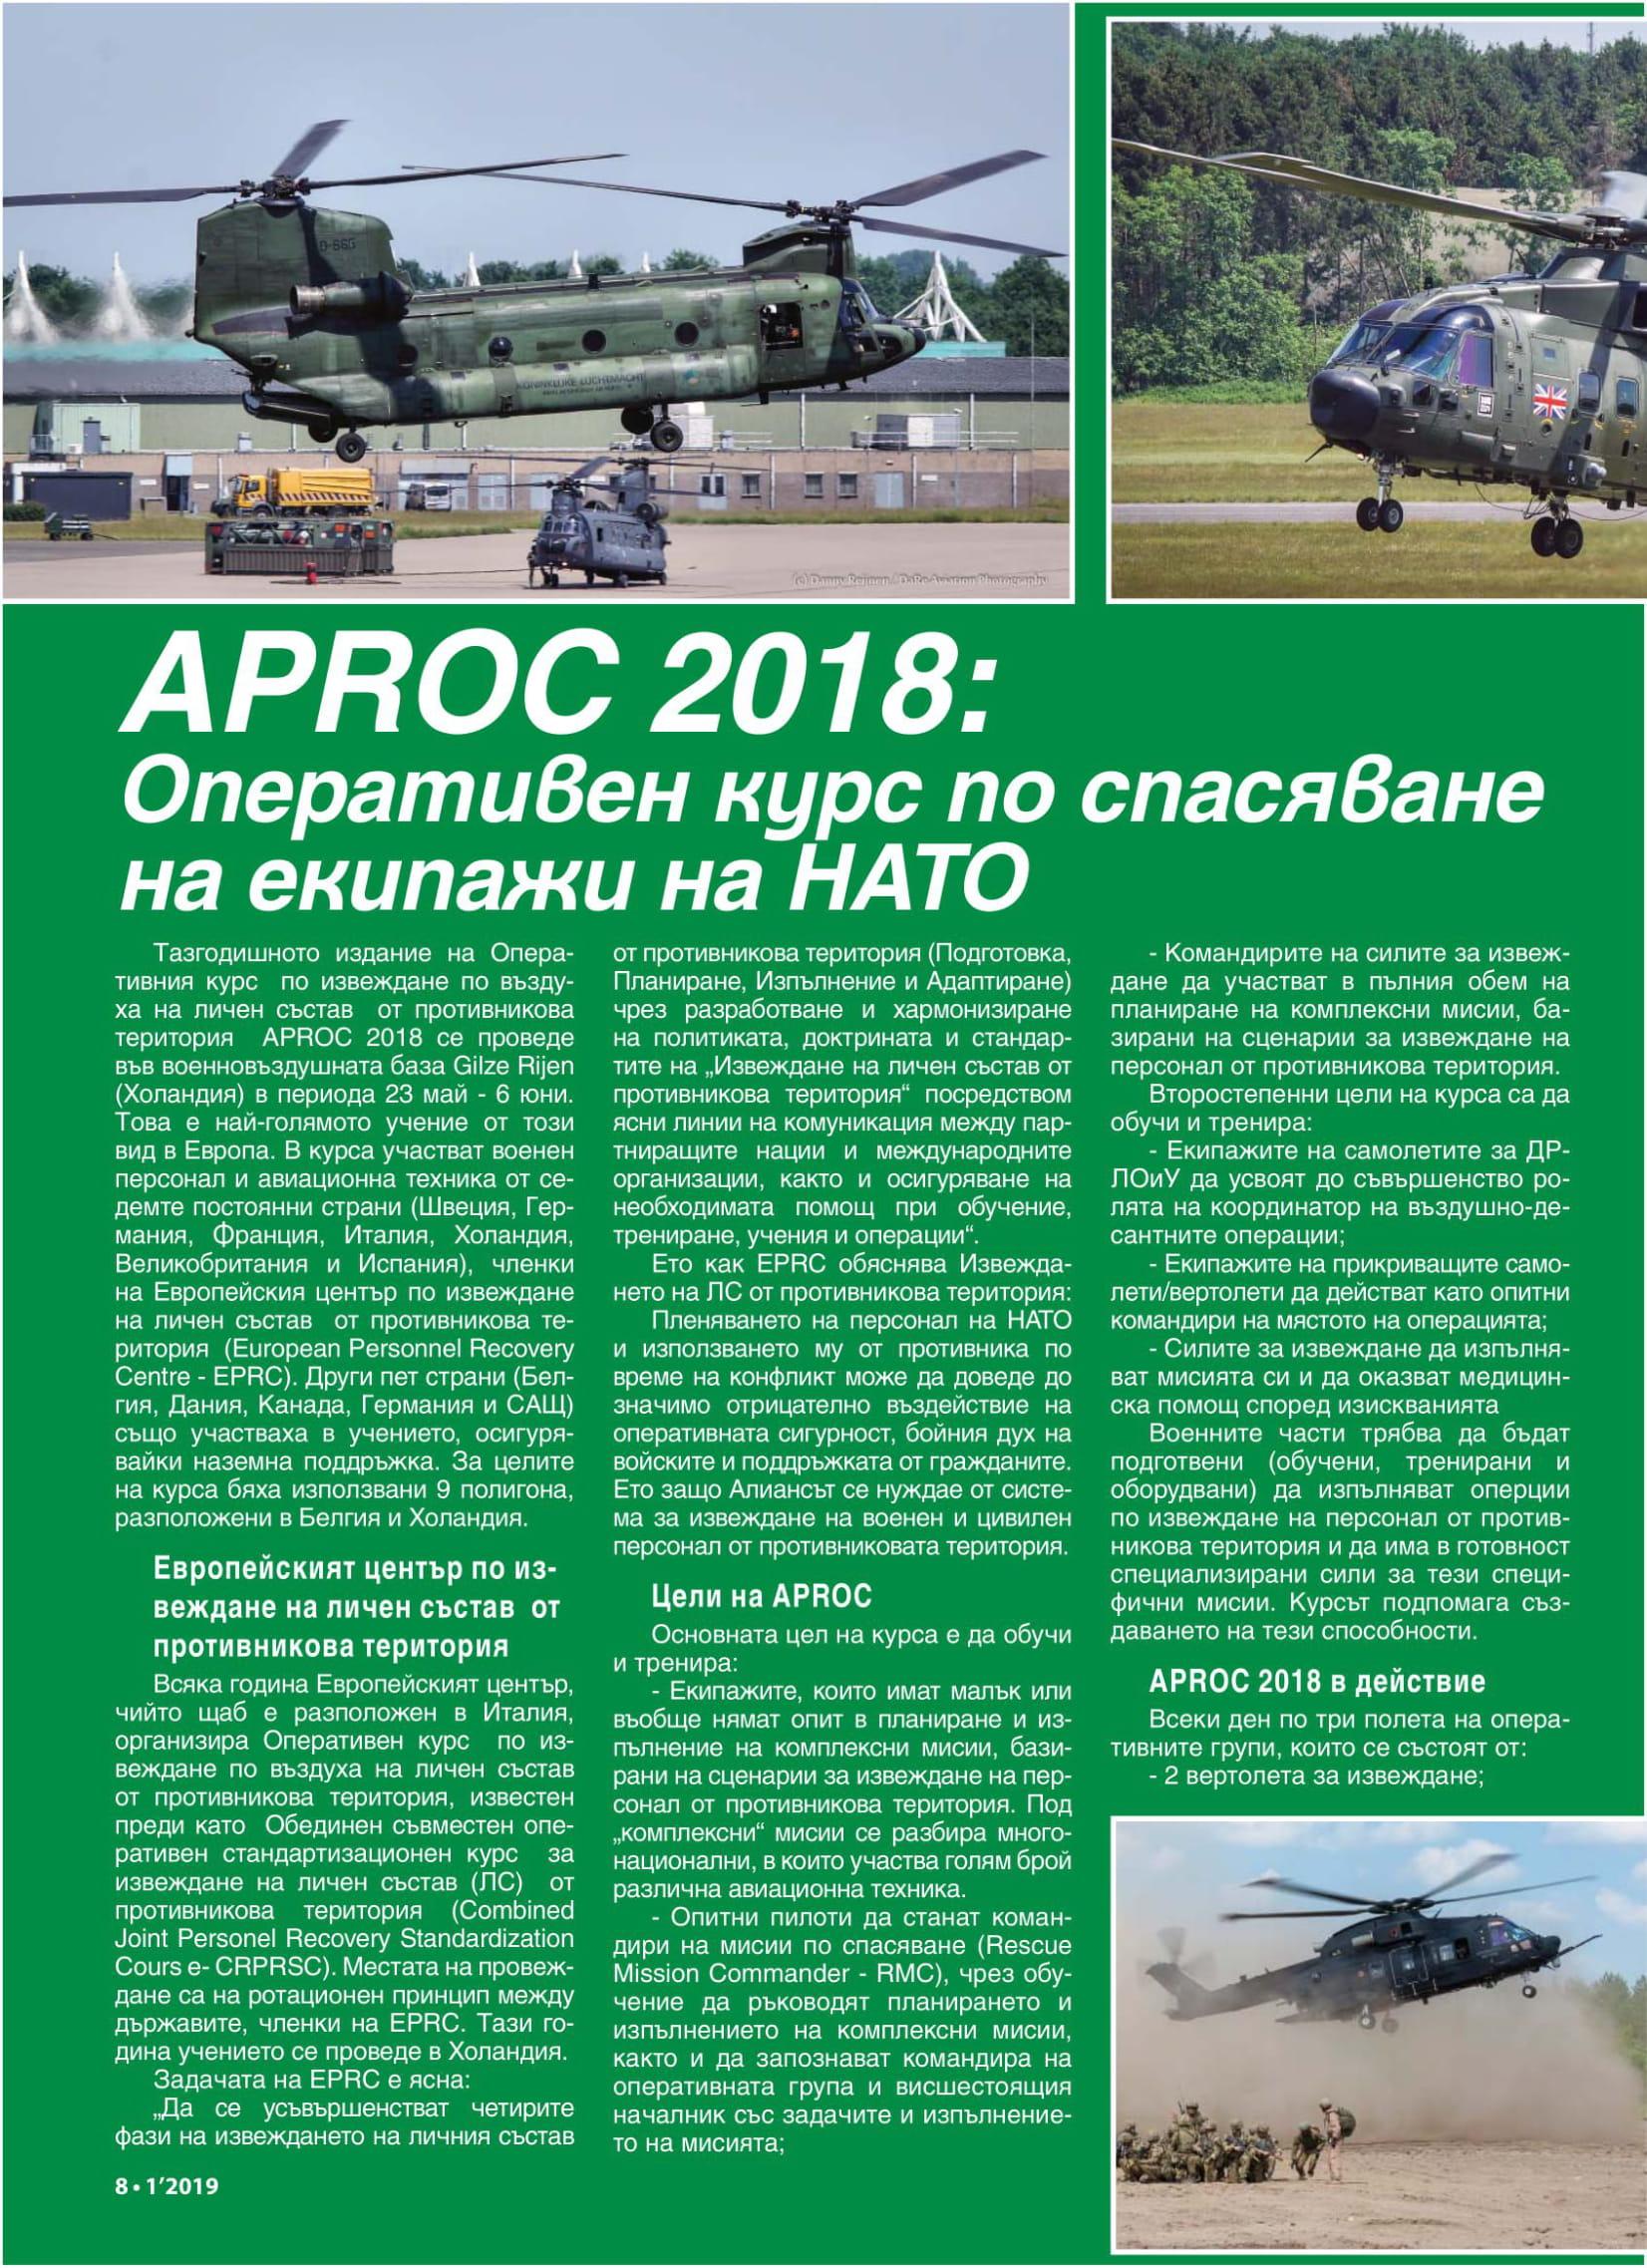 Club Wings (Bulgaria)_APROC 2018-2